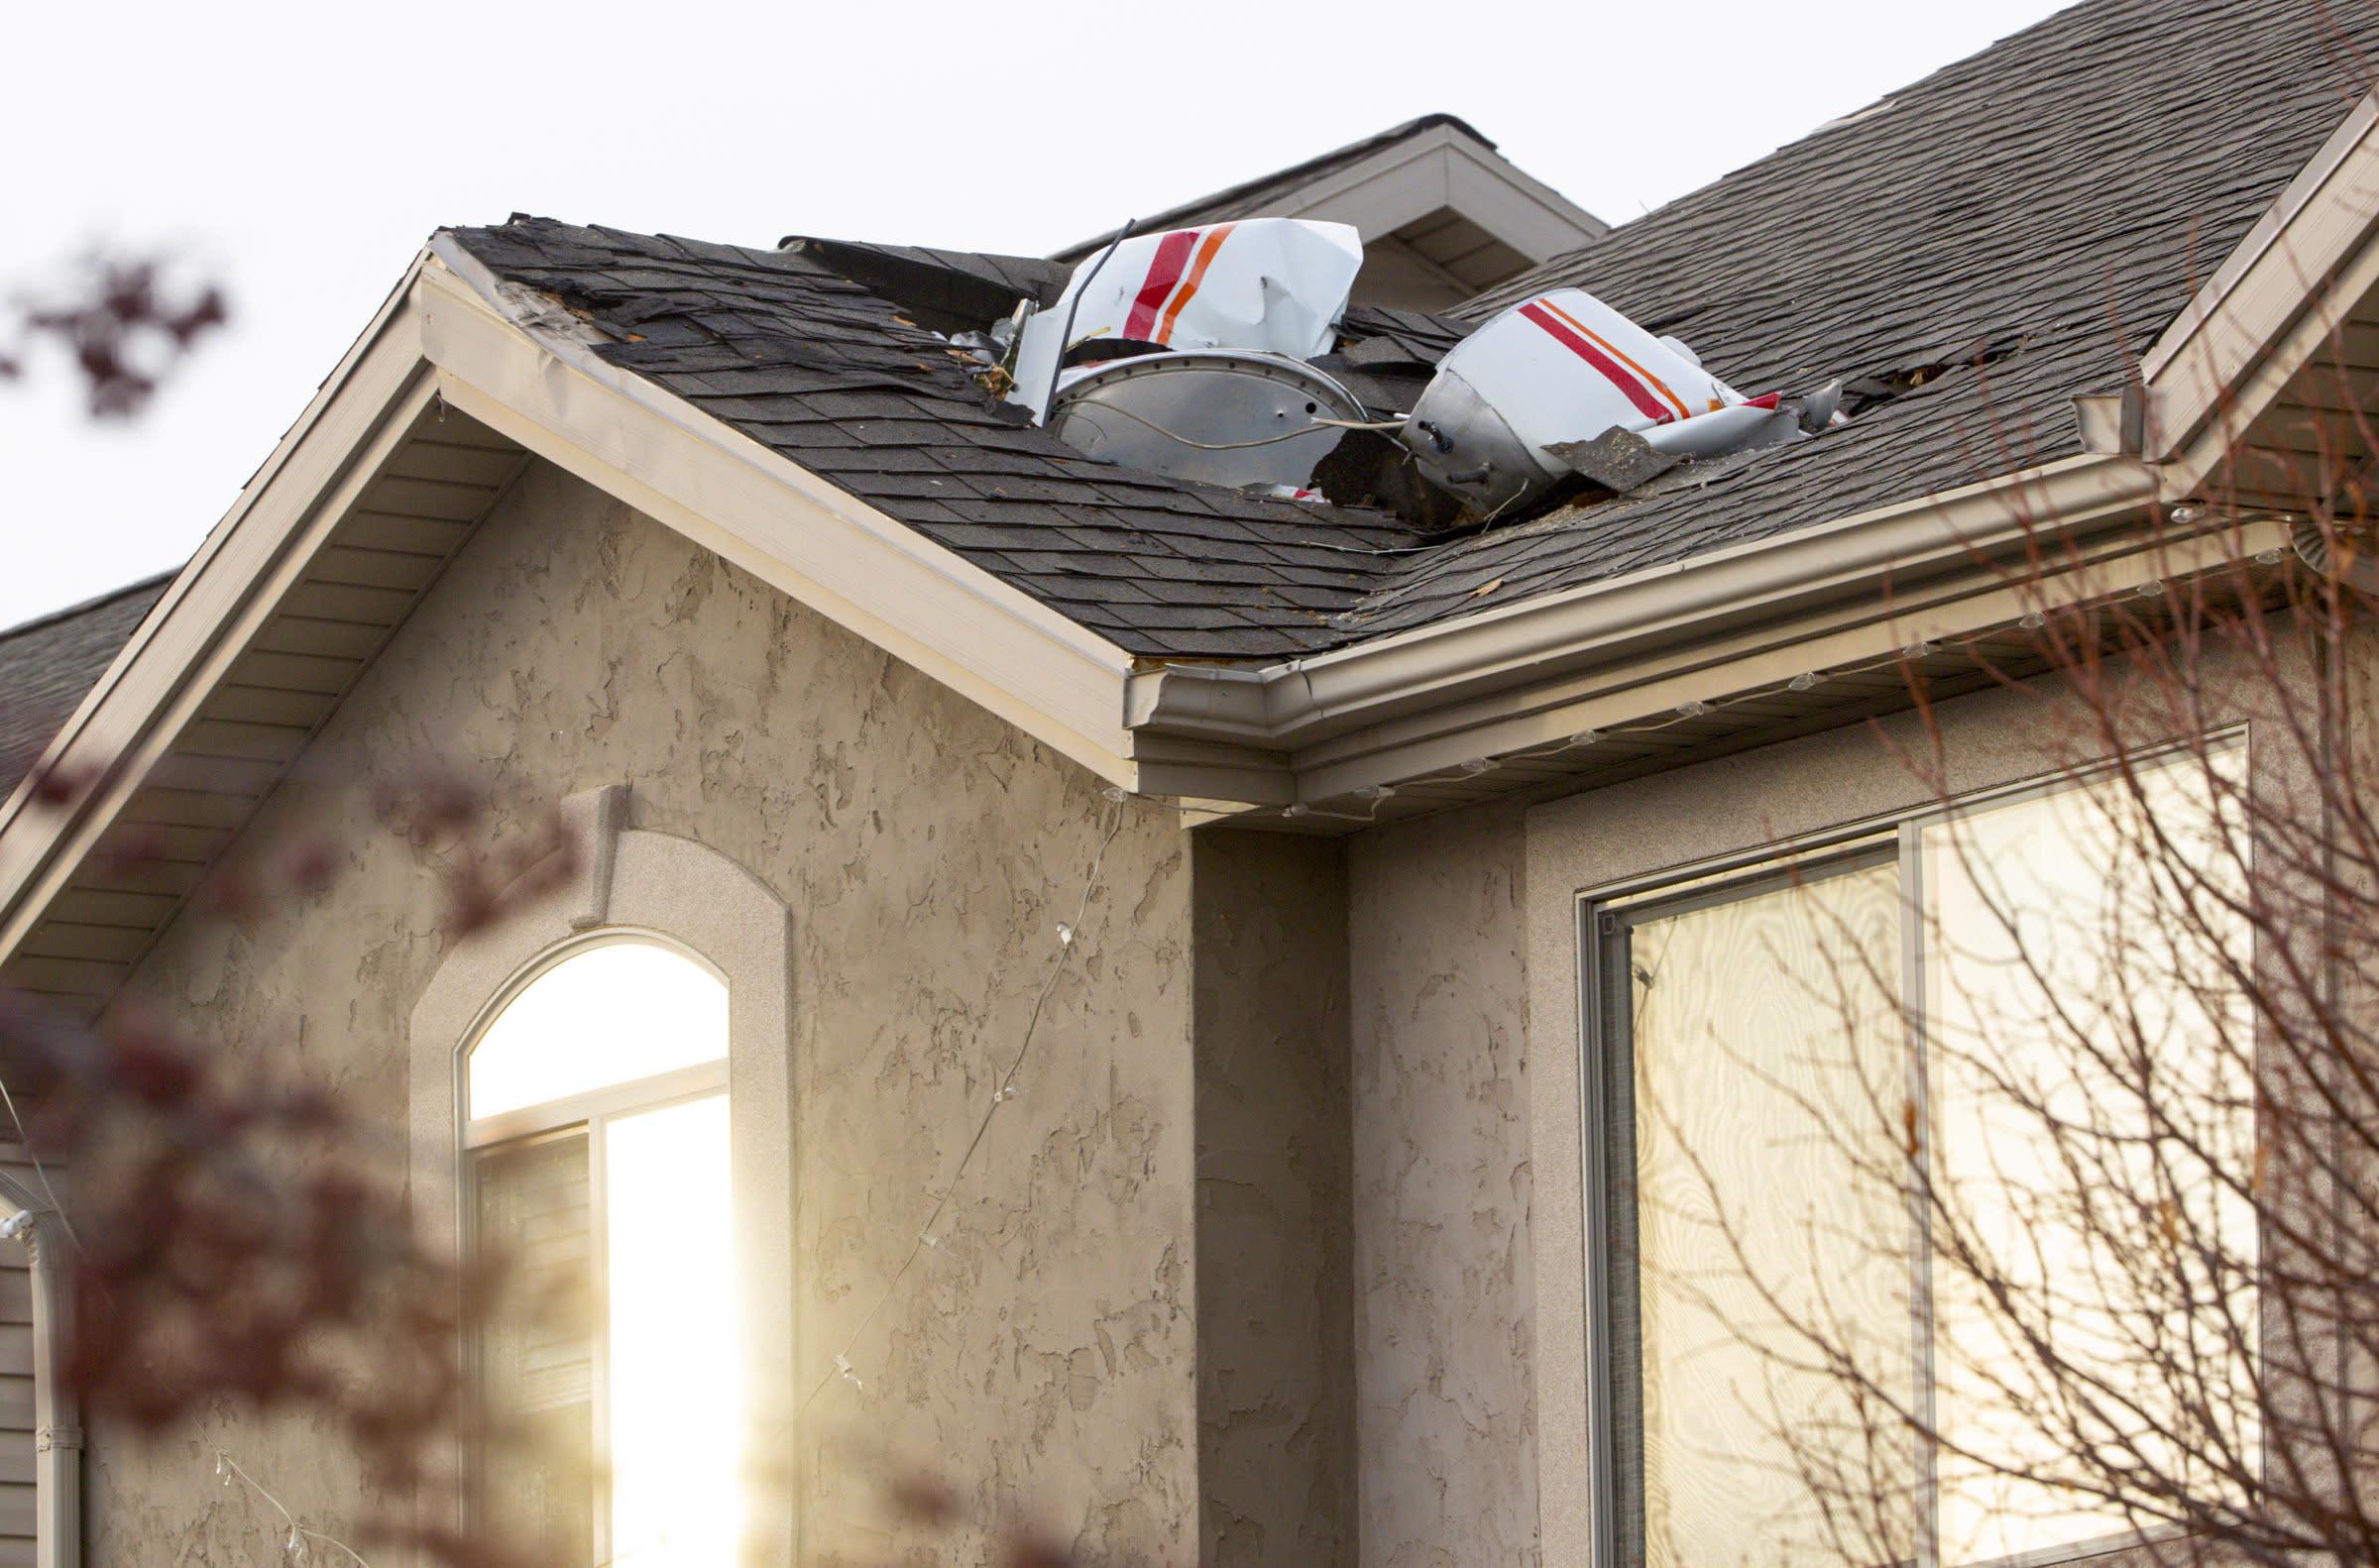 Small Plane Crashes In Utah Neighborhood Killing Pilot